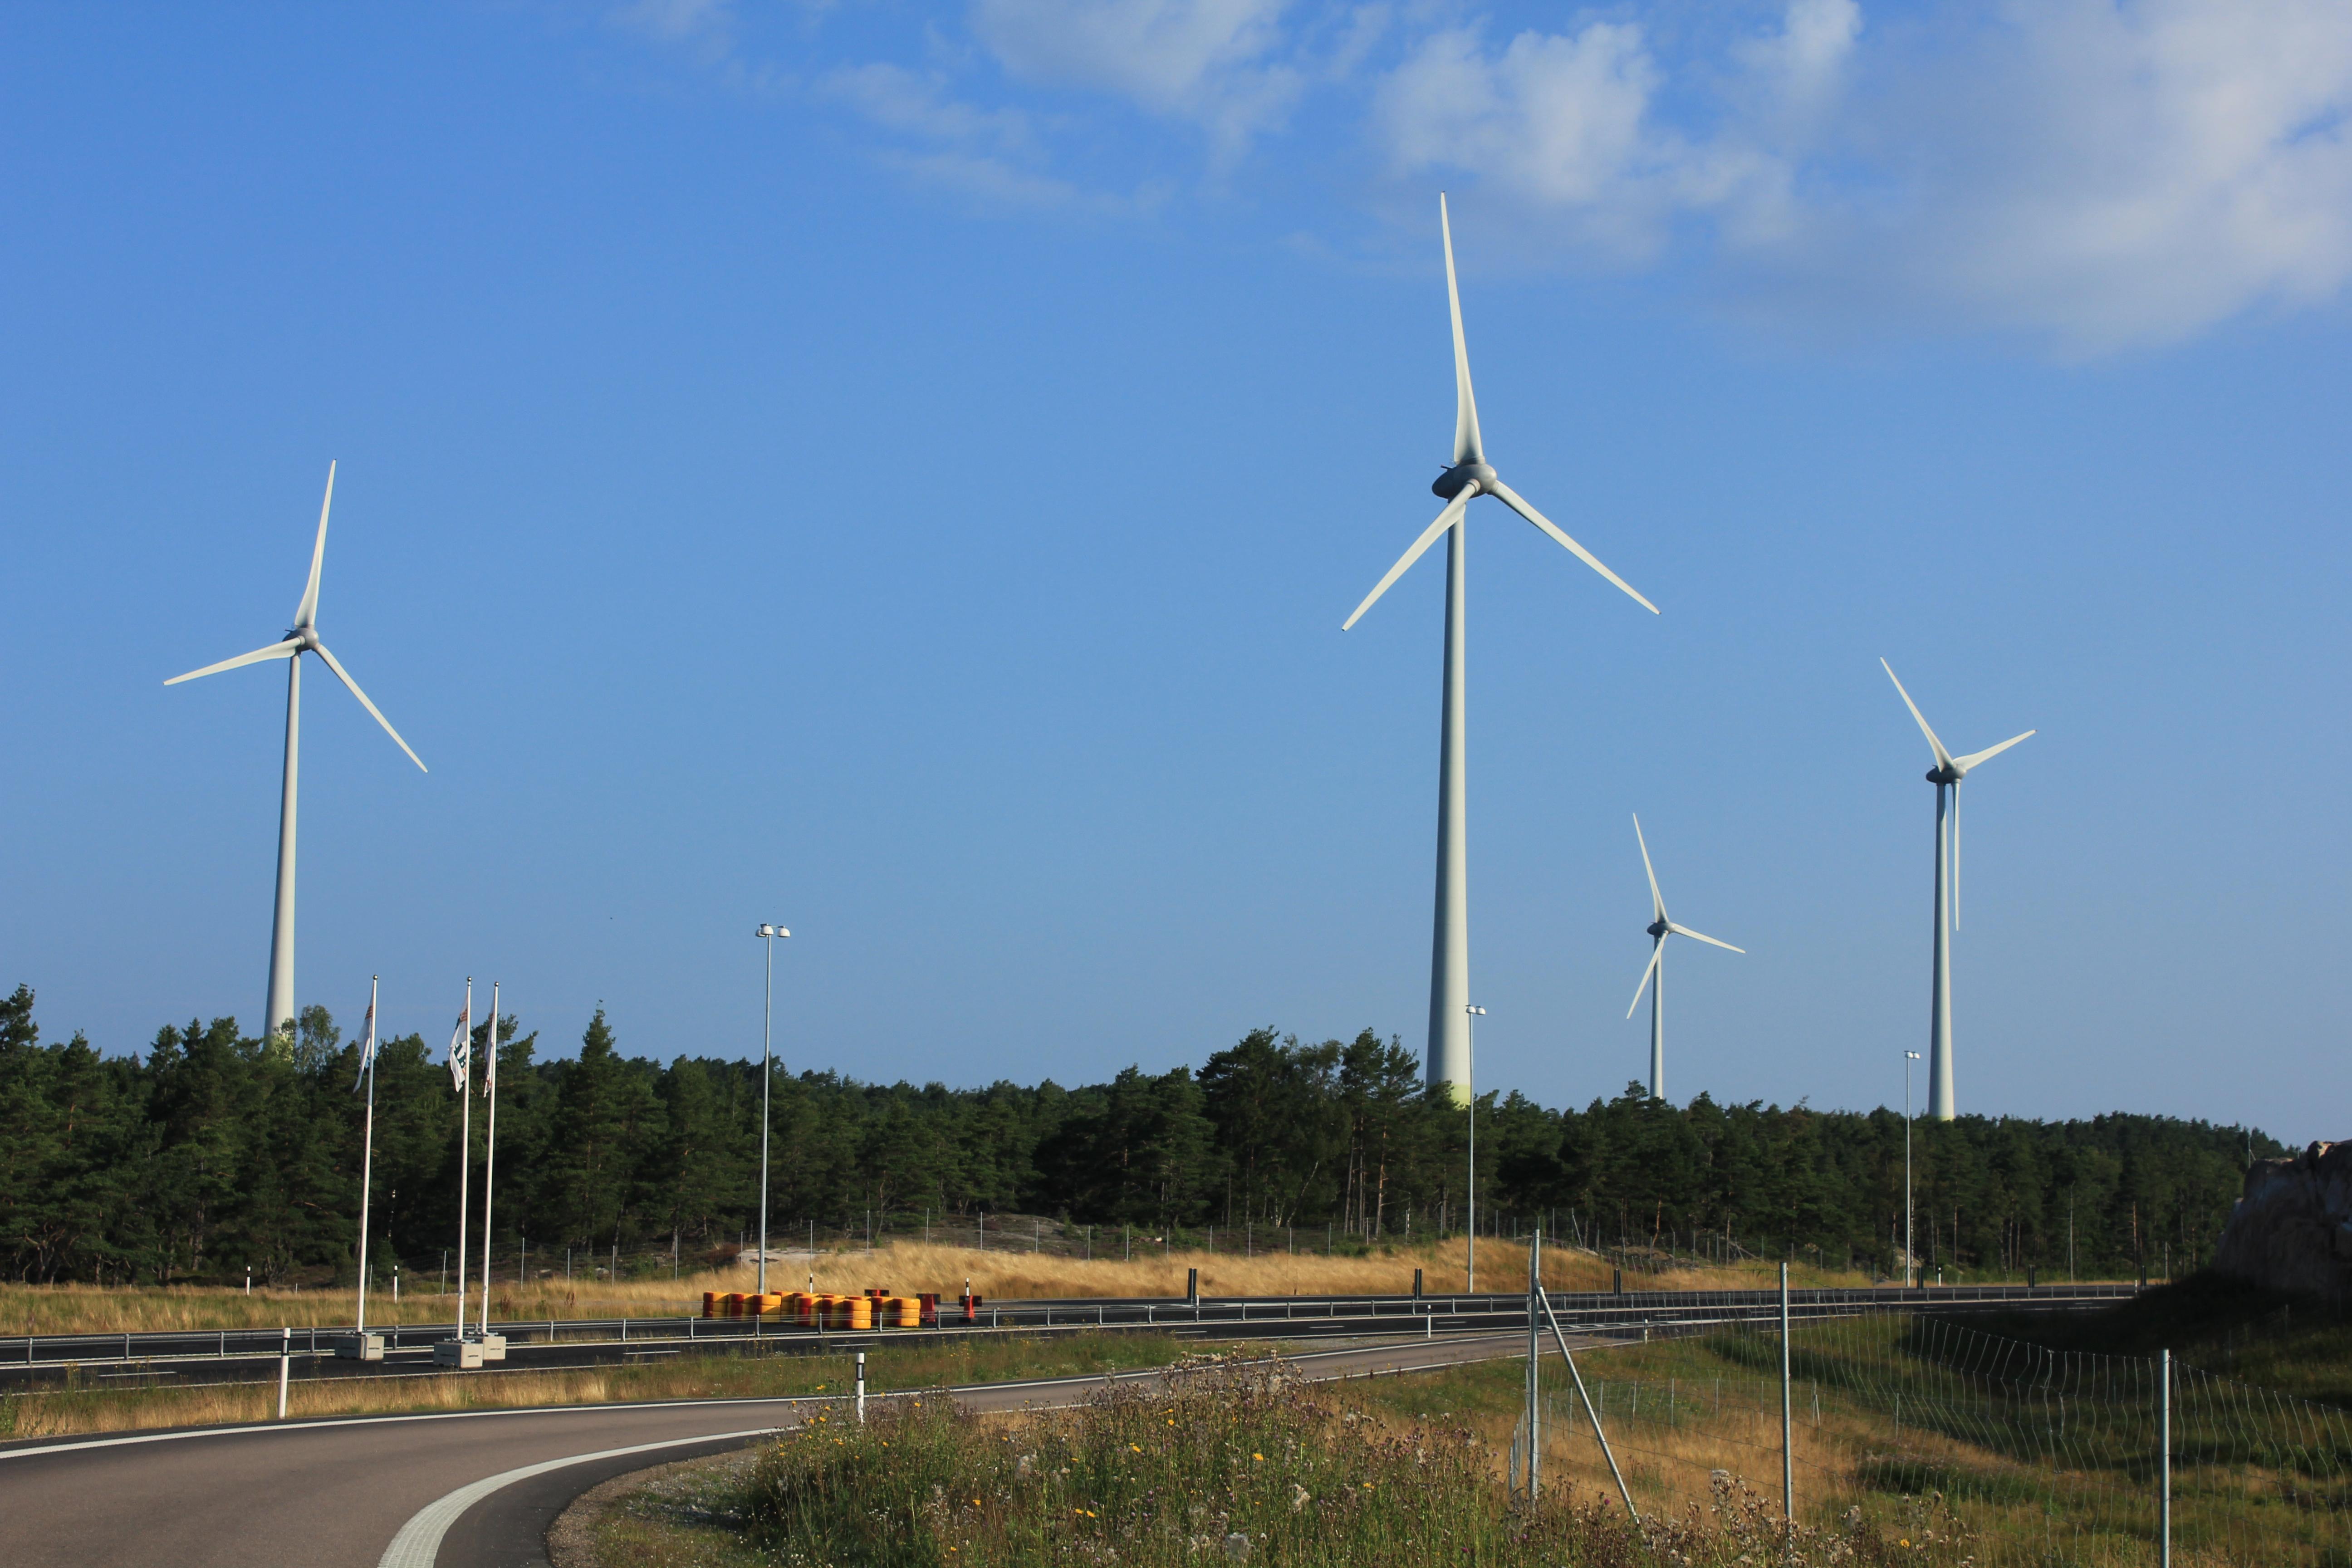 File:Windmills at the Swedish West Coast.JPG - Wikimedia Commons